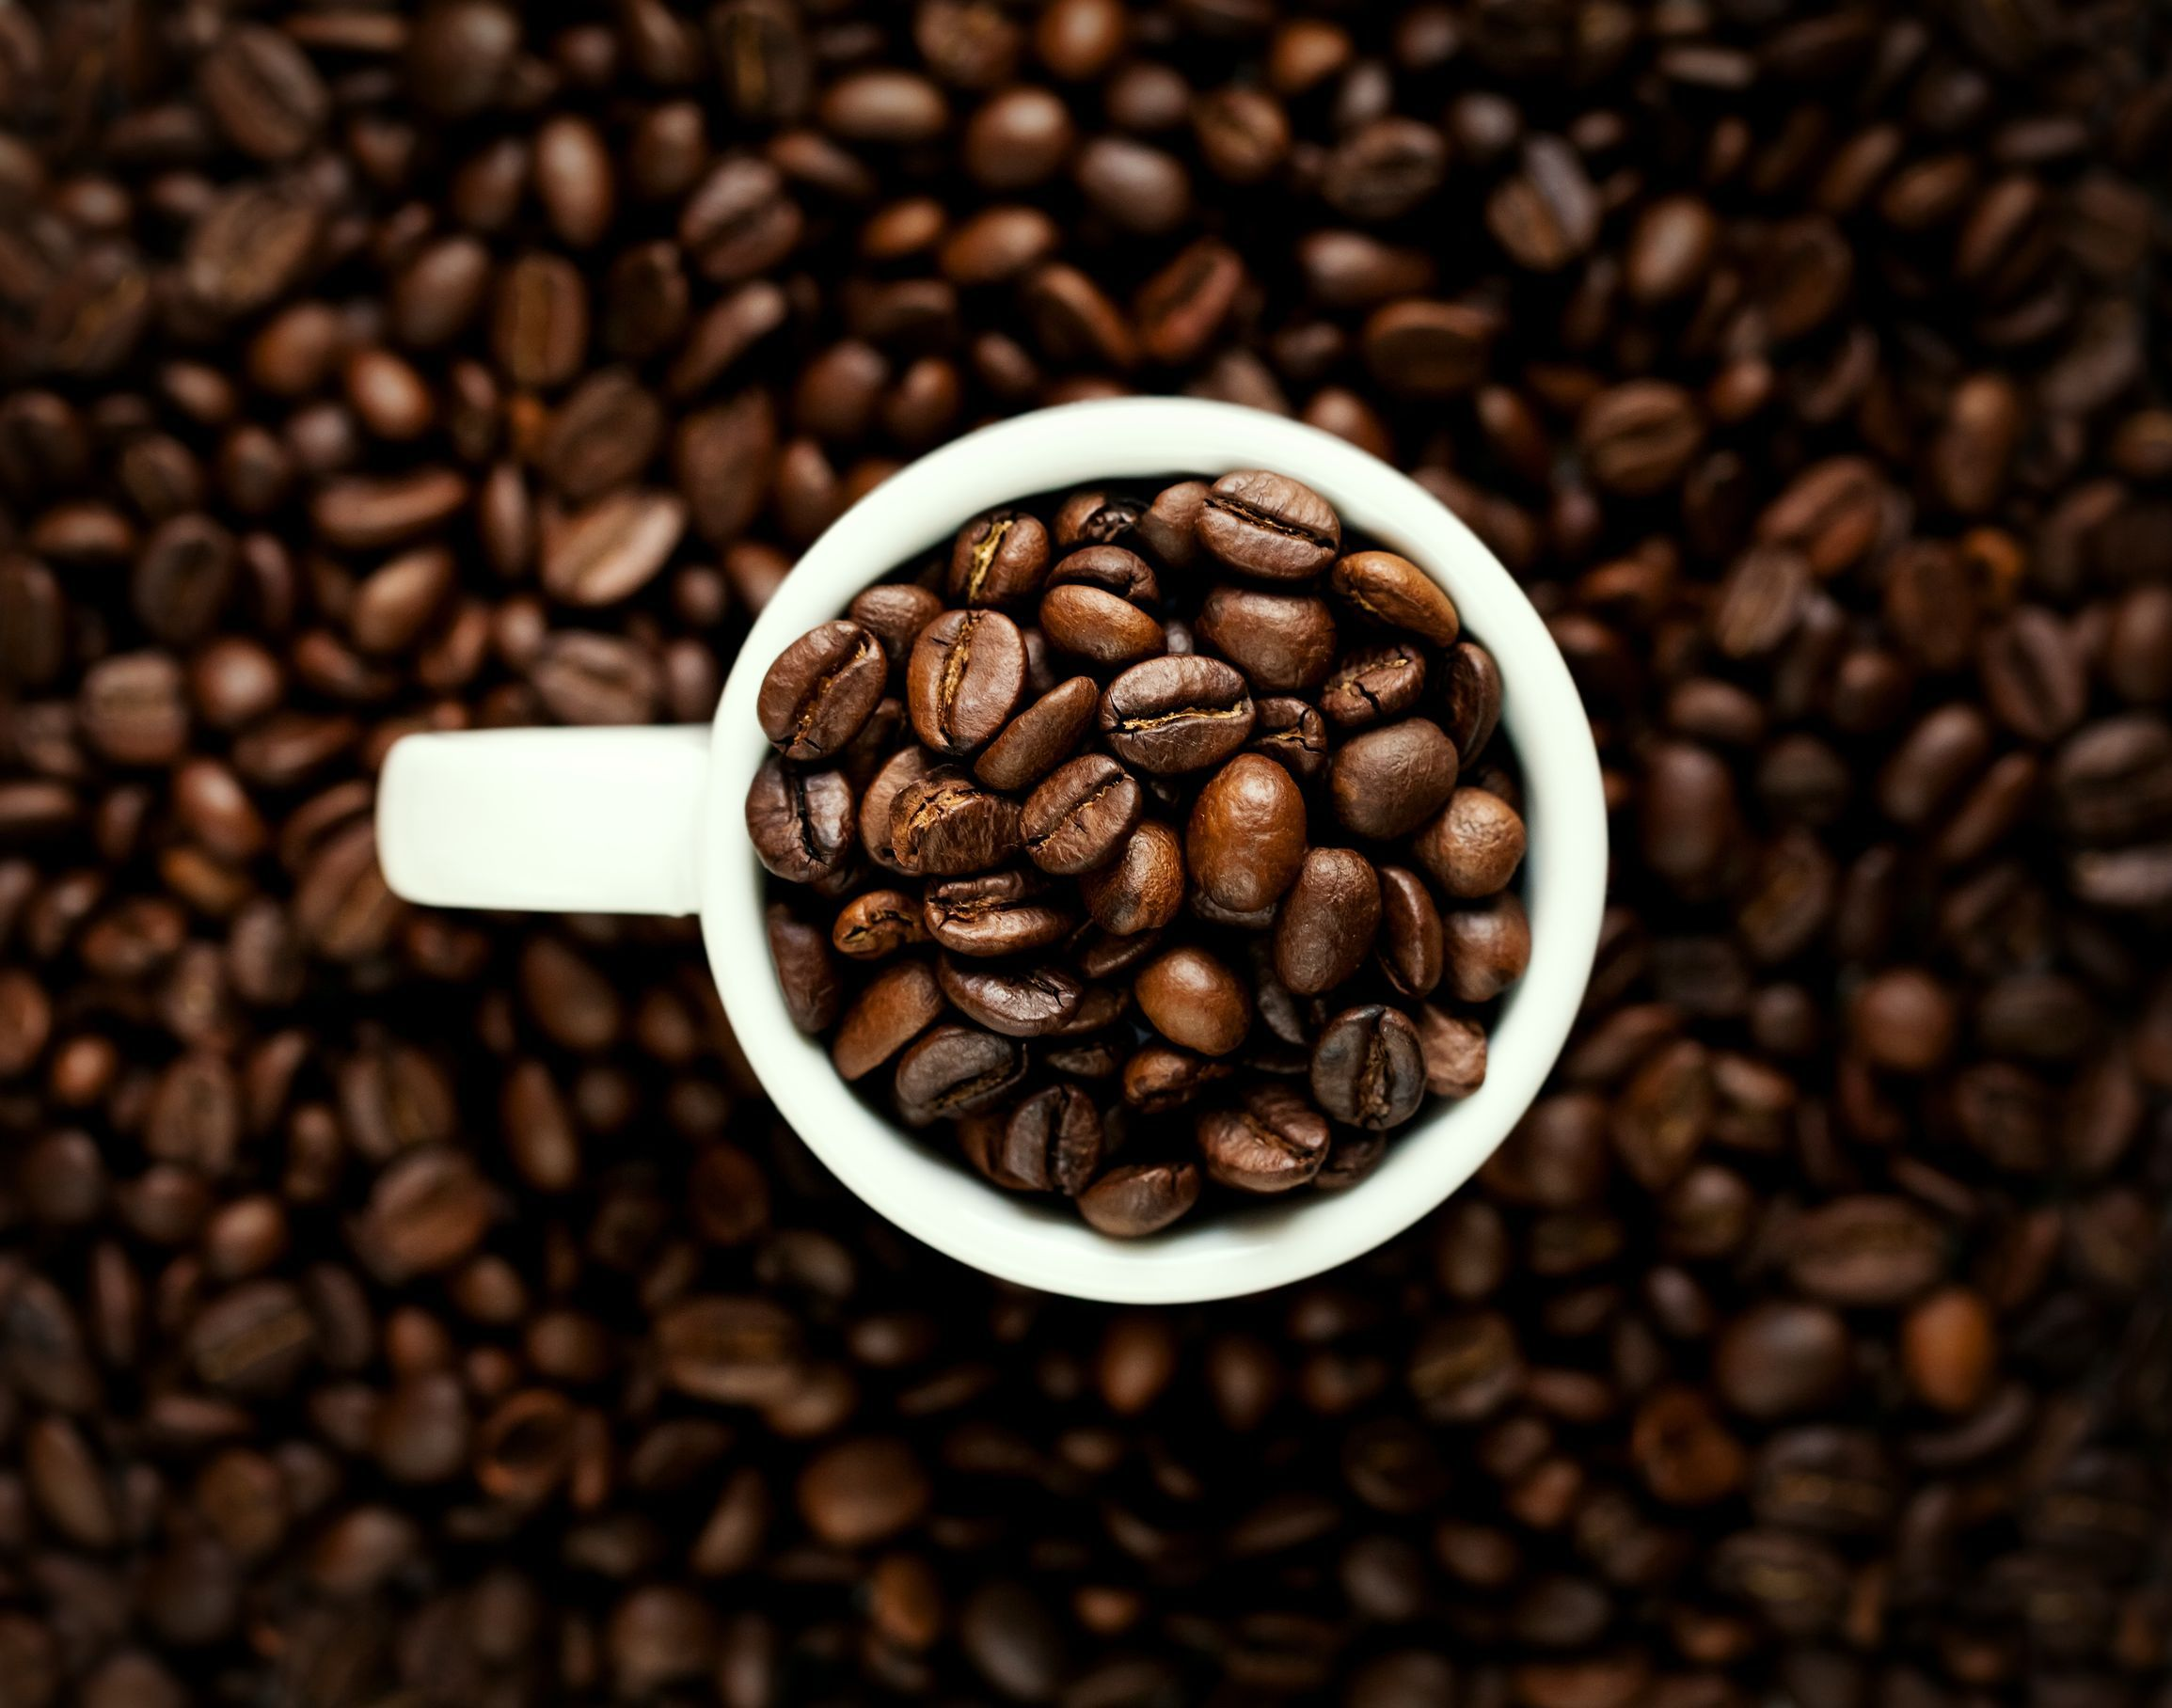 Consumul de cafea la nivel mondial va atinge un nivel record în 2016